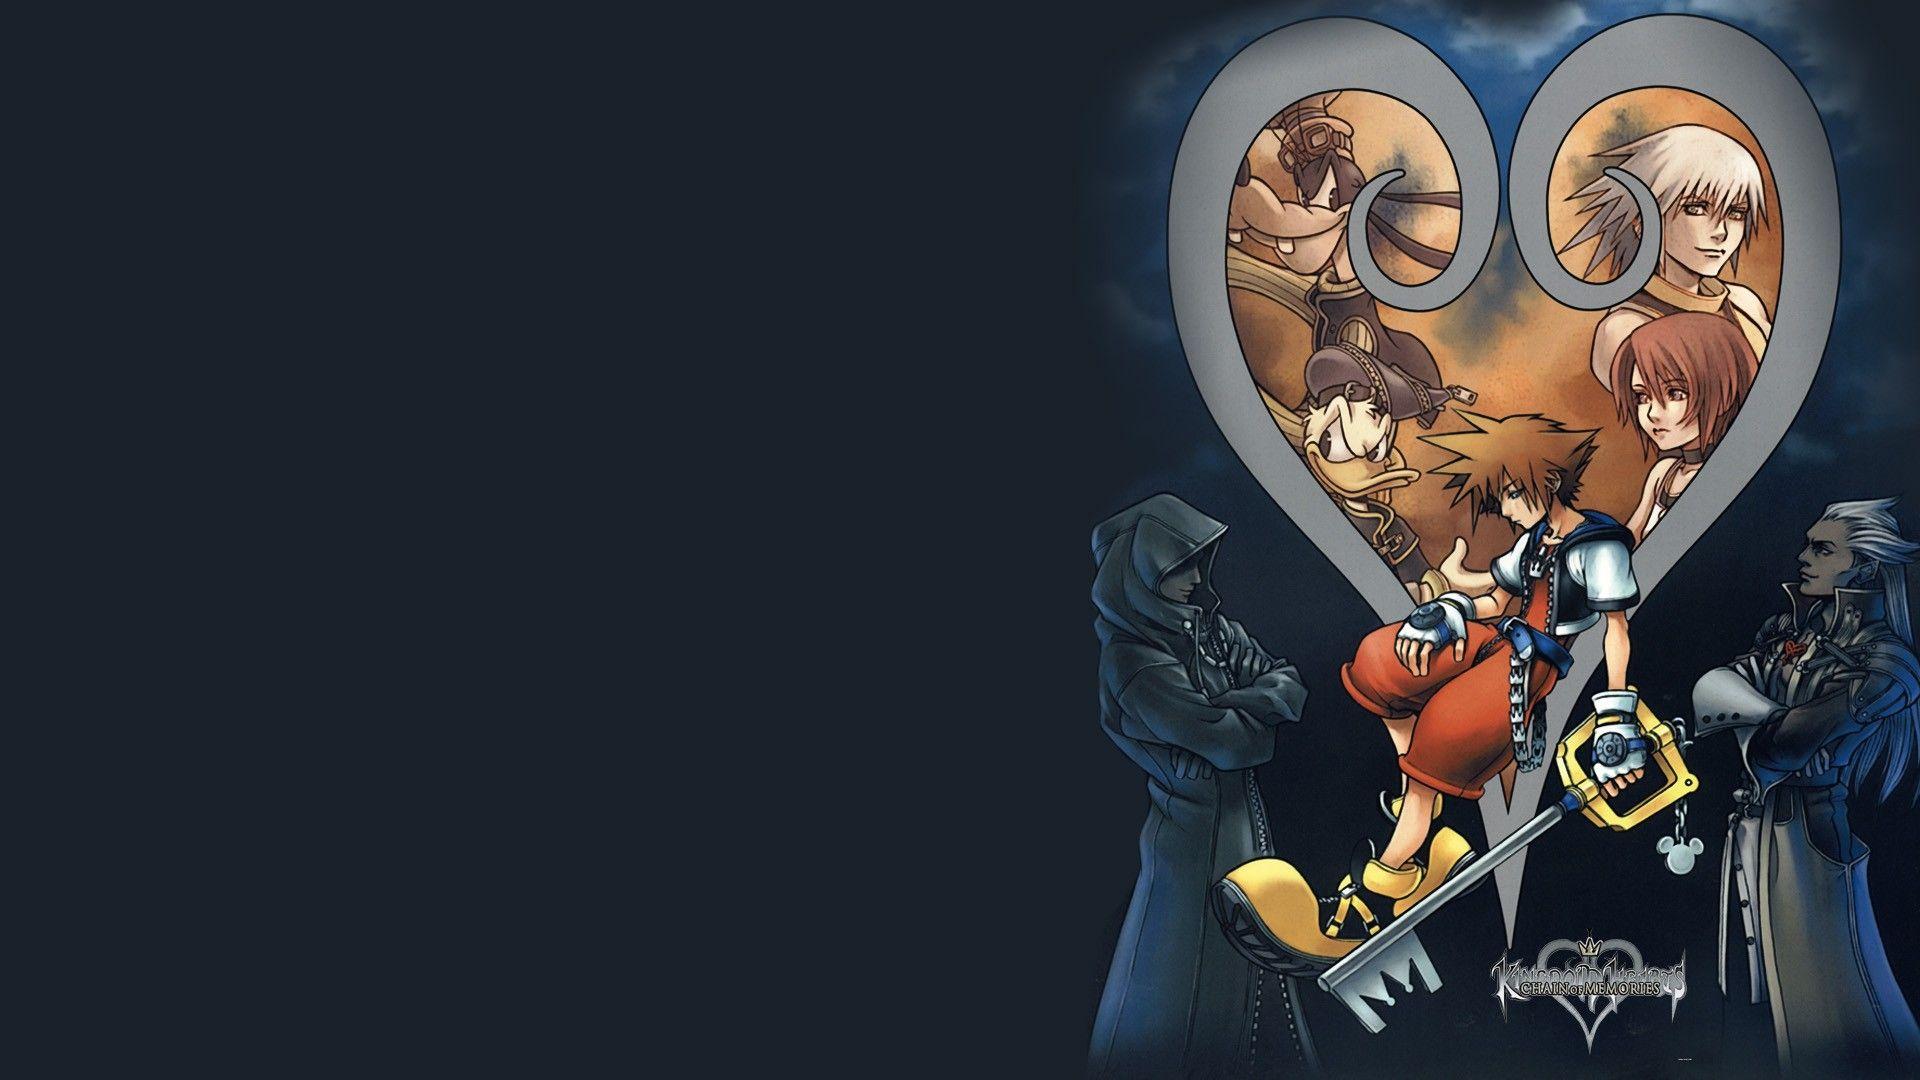 Awesome Kingdom Hearts Desktop Wallpaper Kingdom hearts